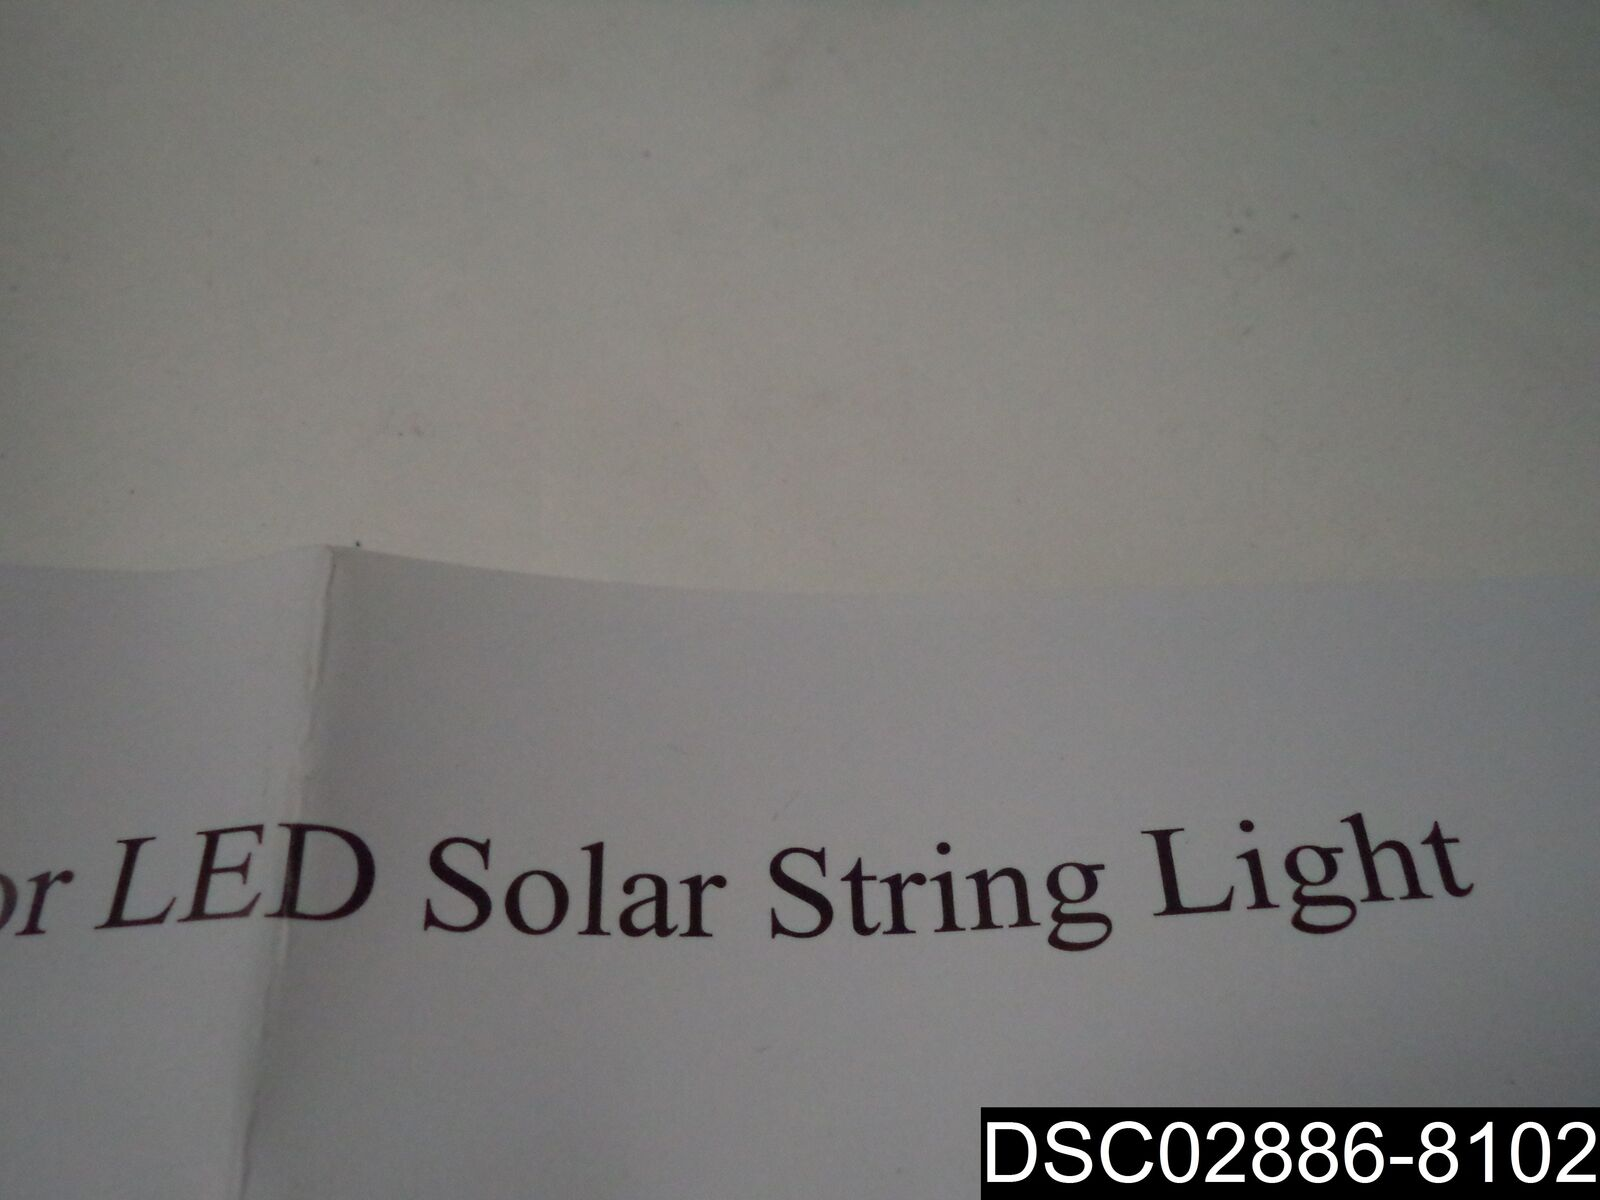 Solar Patio Patio Patio Outdoor Umbrella LED String Lights Cool Weiß 07USL005-5AL30-CLW 63afc8